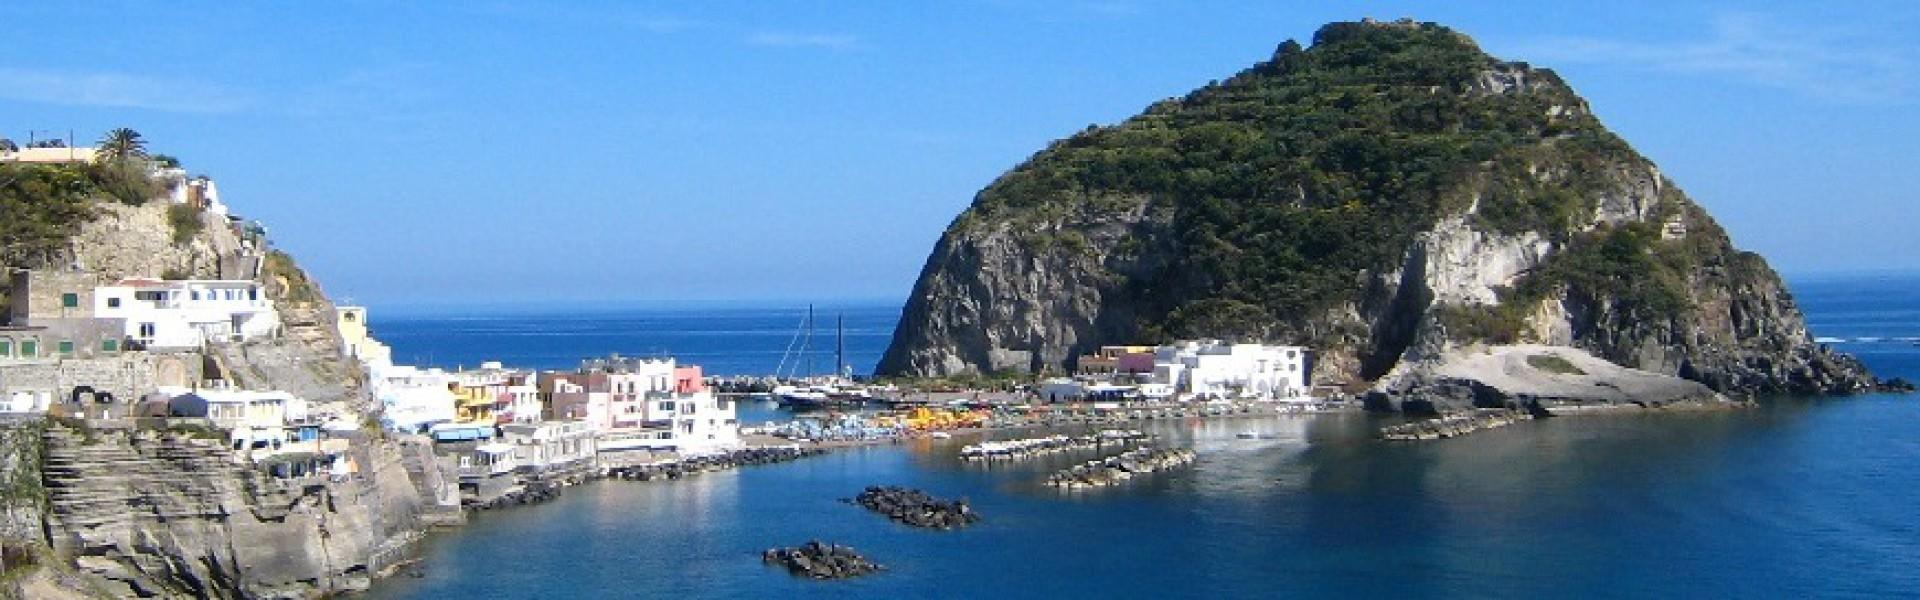 cropped-Ischia-SantAngelo11.jpg